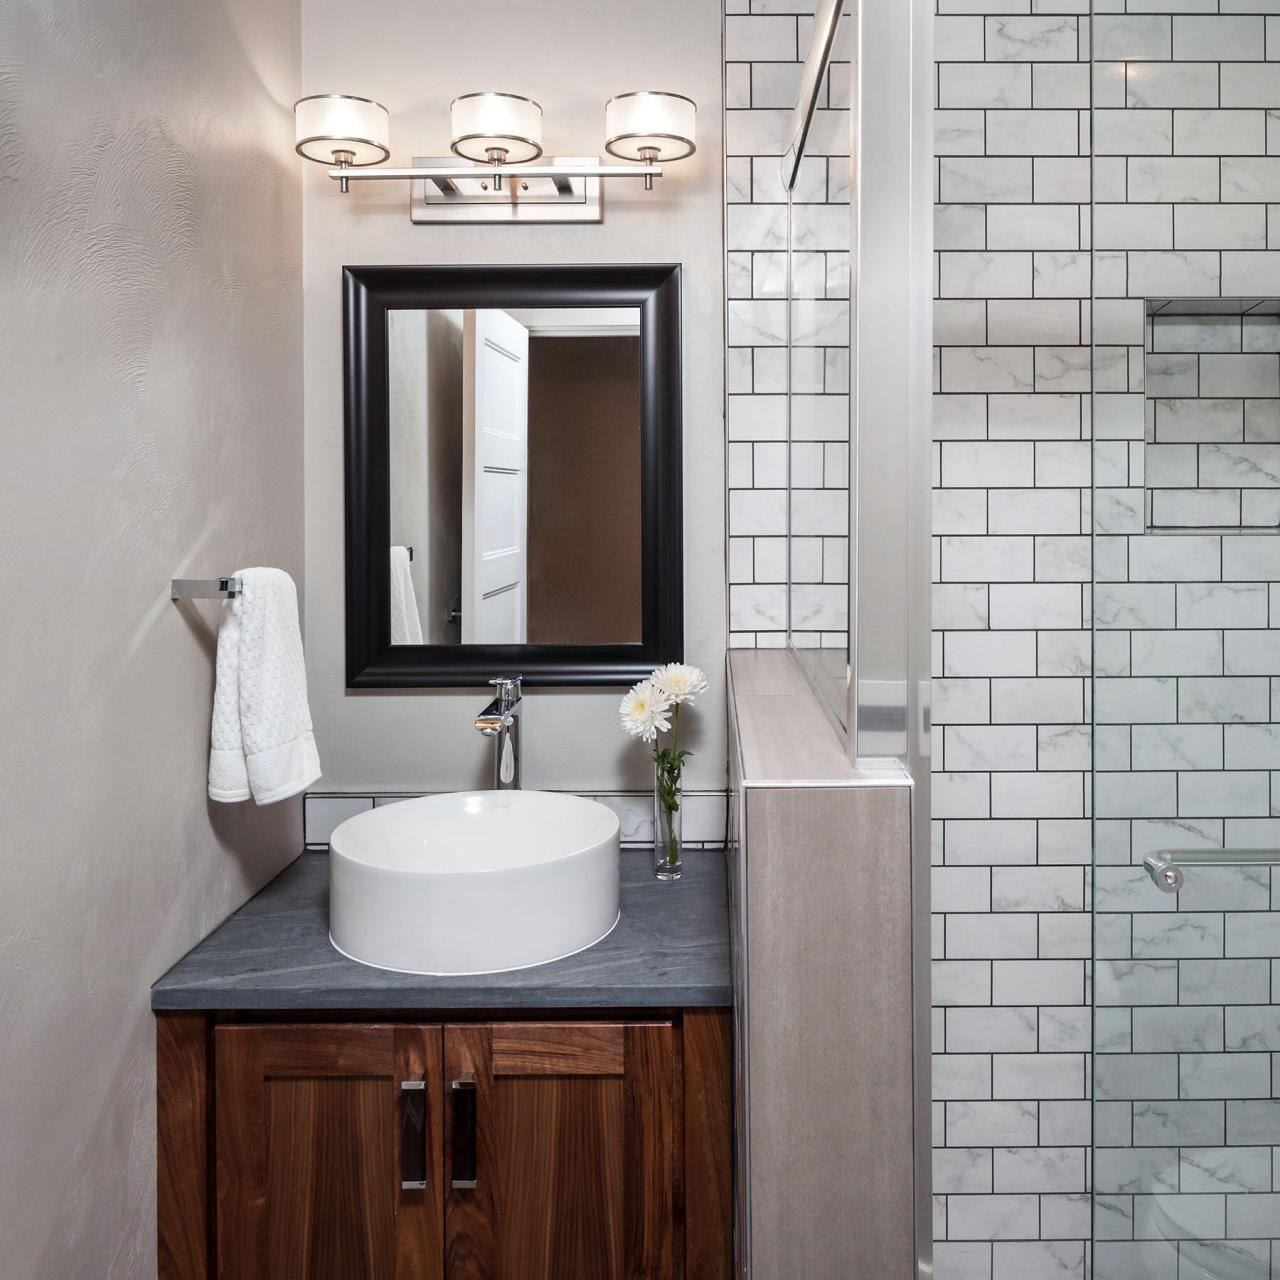 Small Bathrooms | HGTV